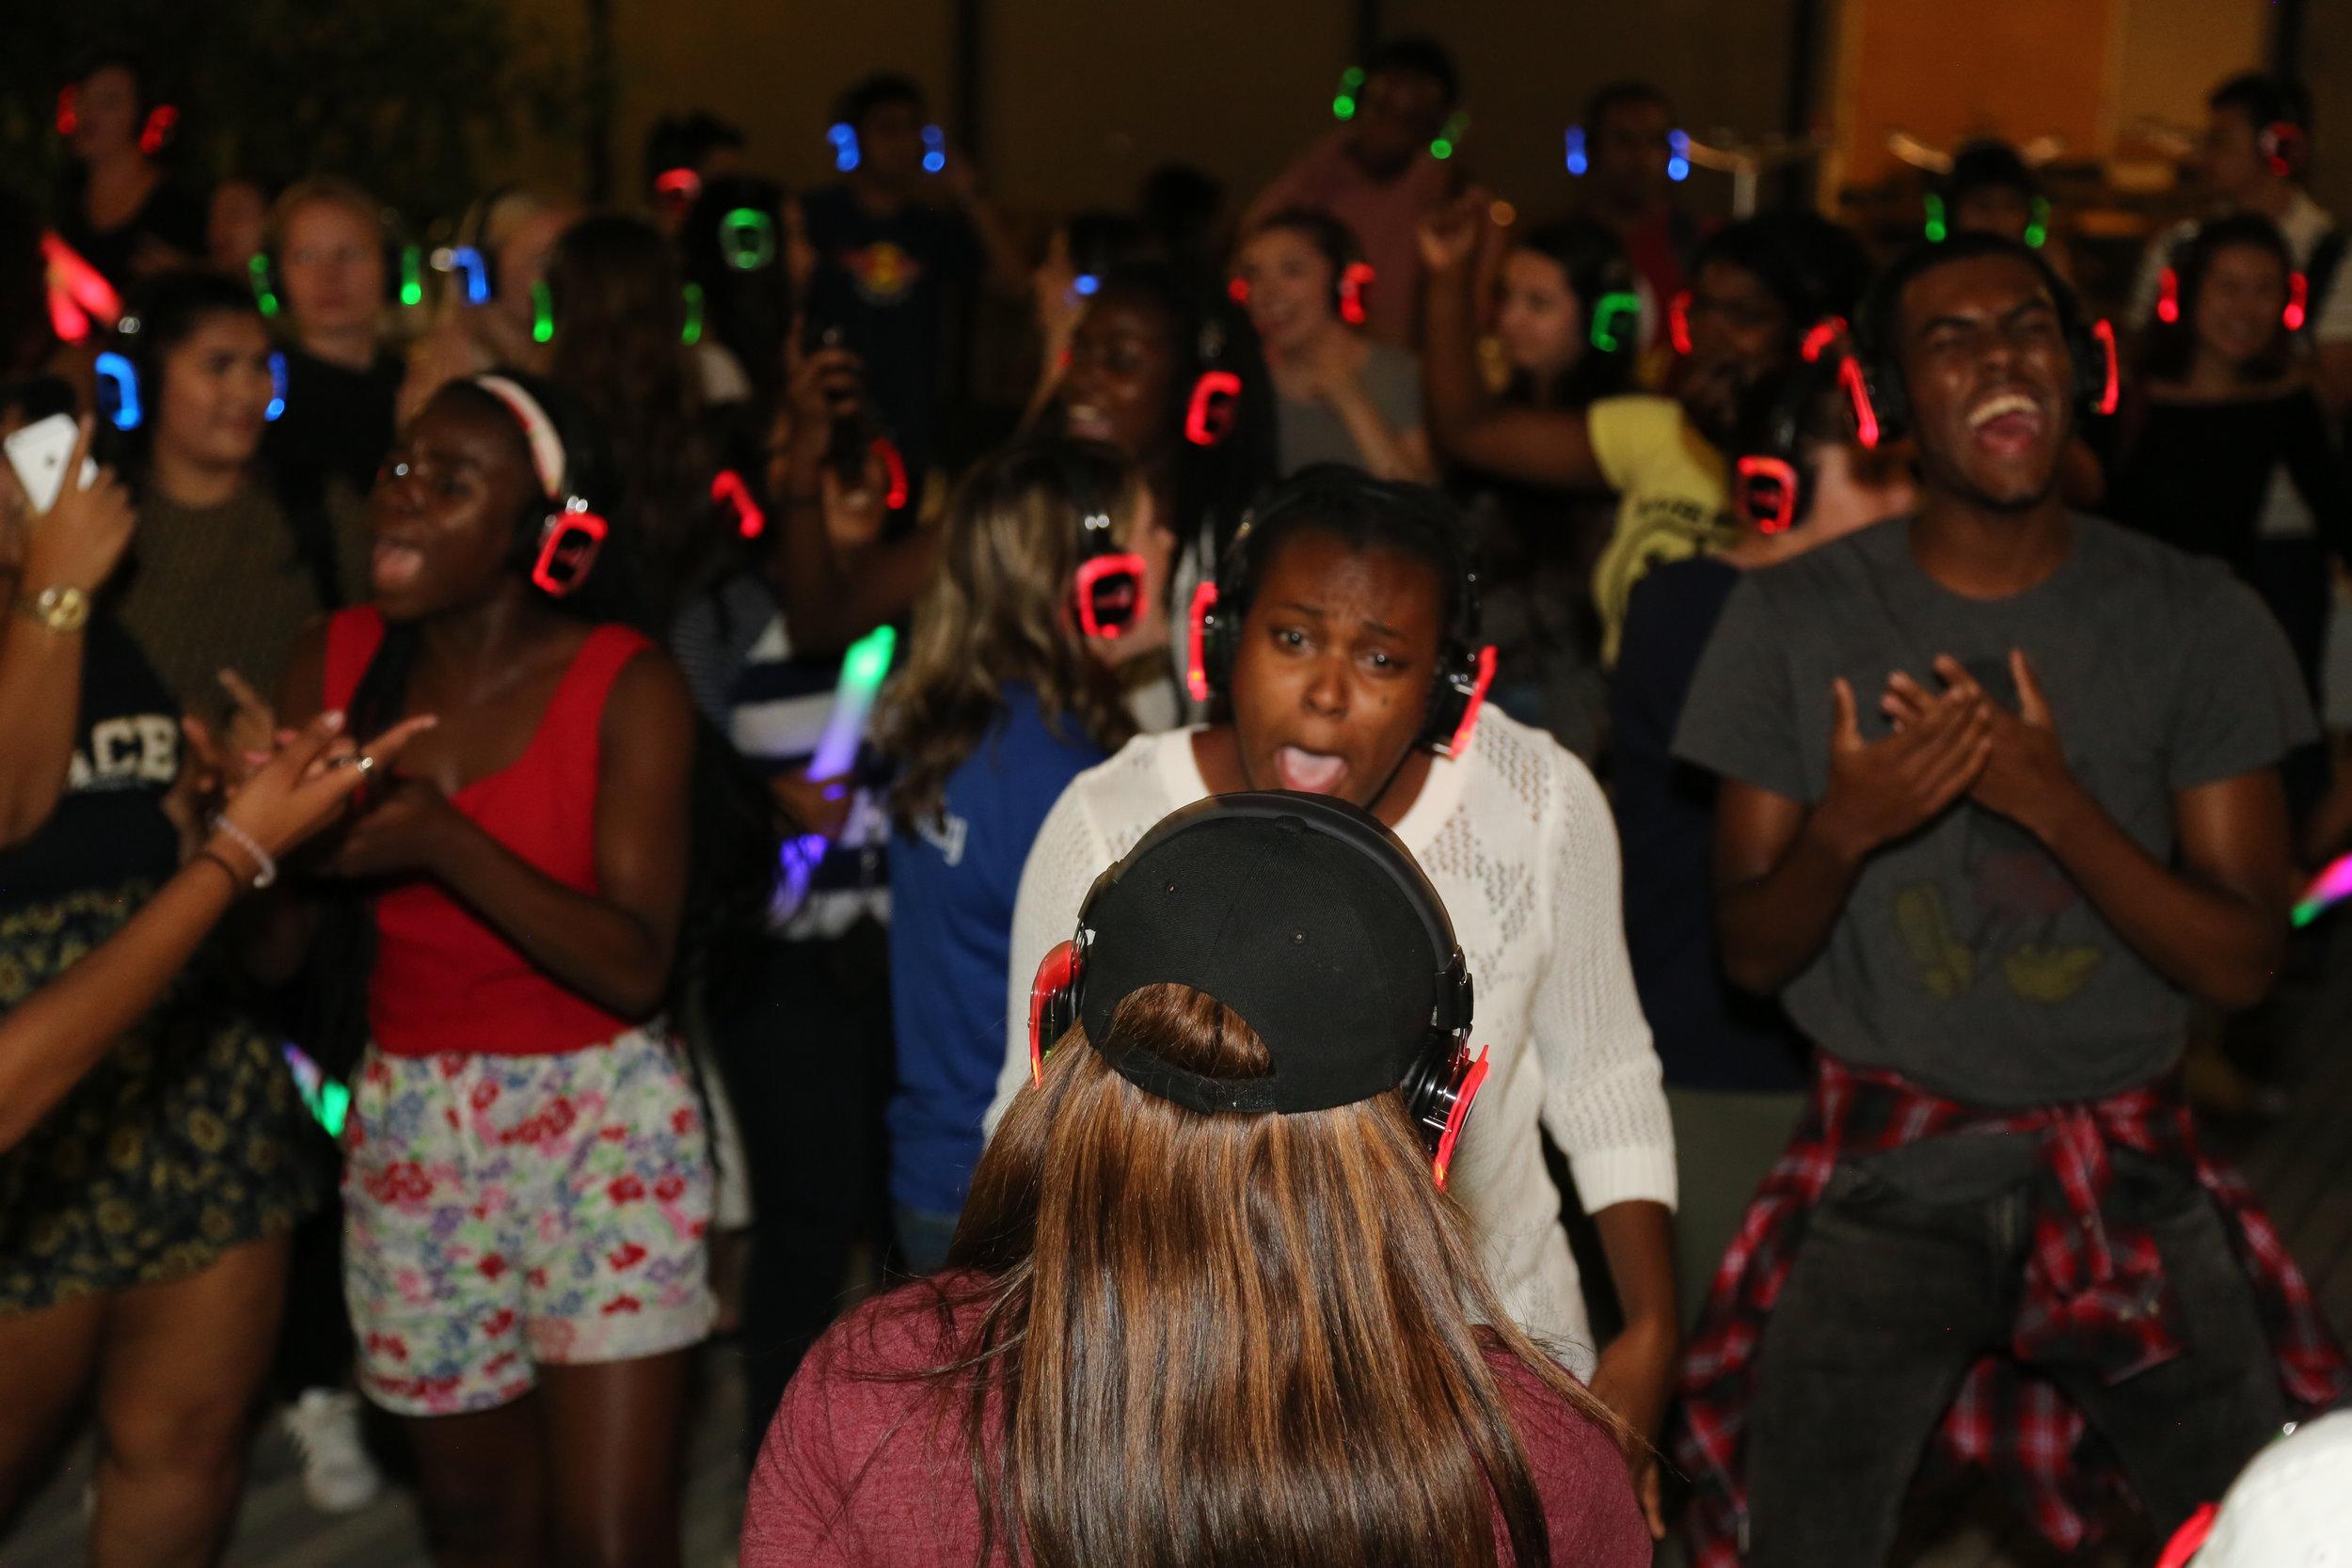 Pace University Silent Party 2017